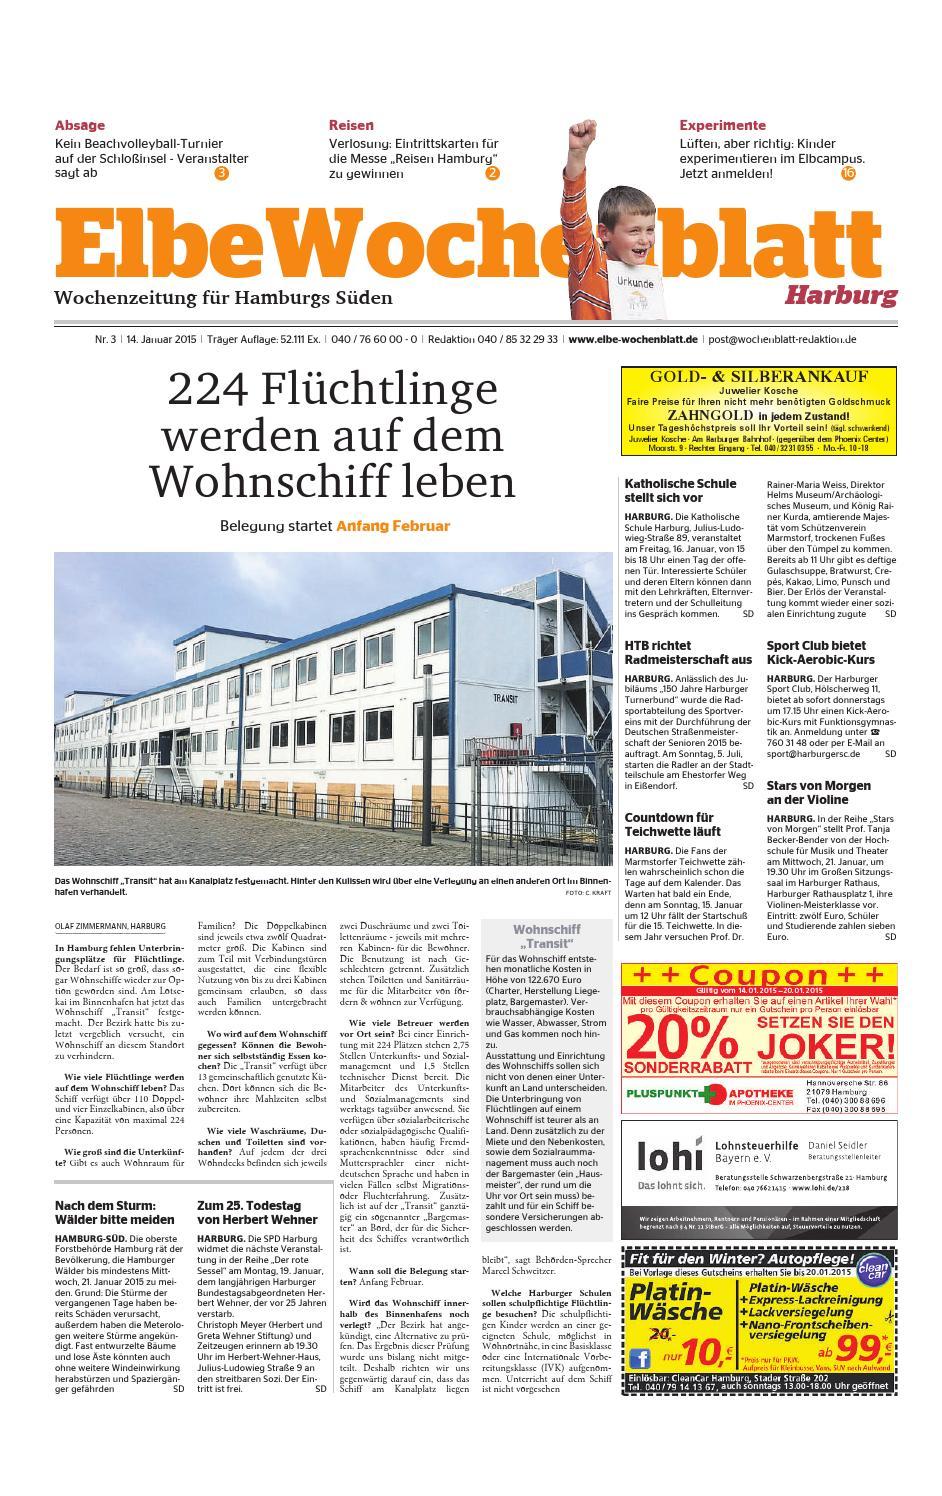 Harburg KW03 2015 by Elbe Wochenblatt Verlagsgesellschaft mbH & Co